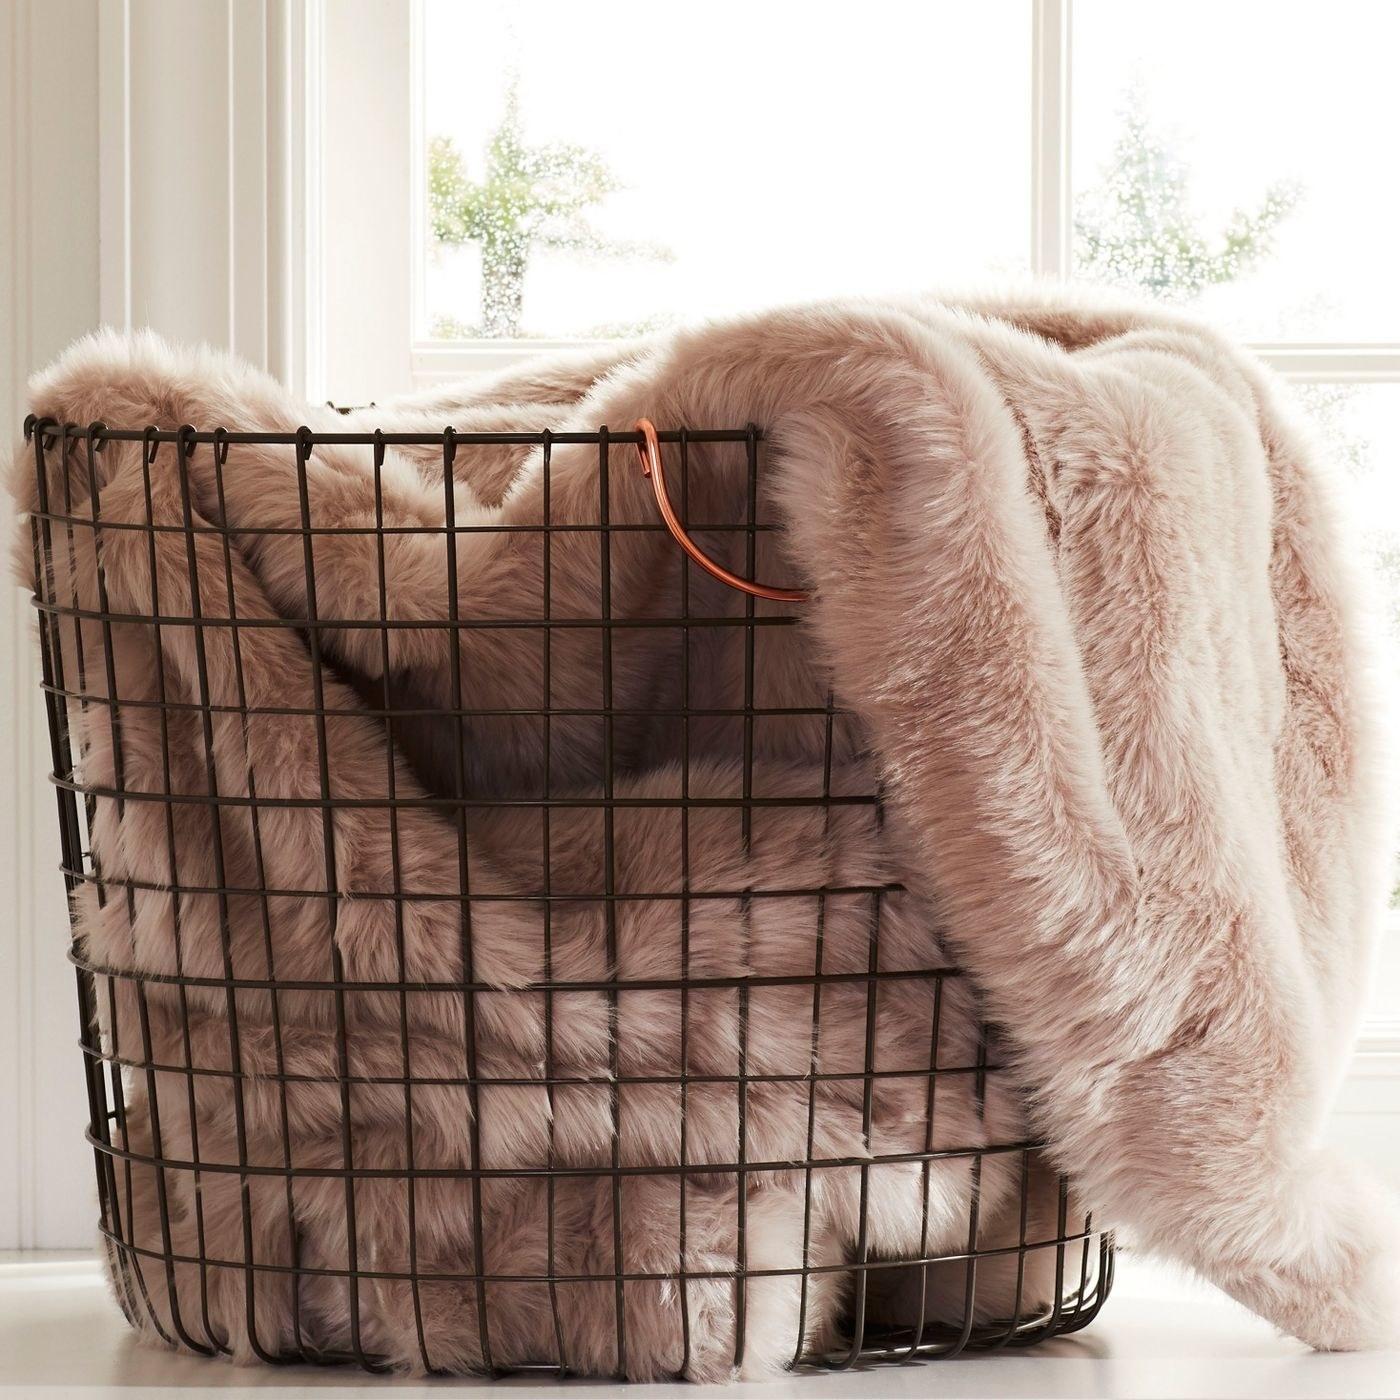 Blanket in wire basket